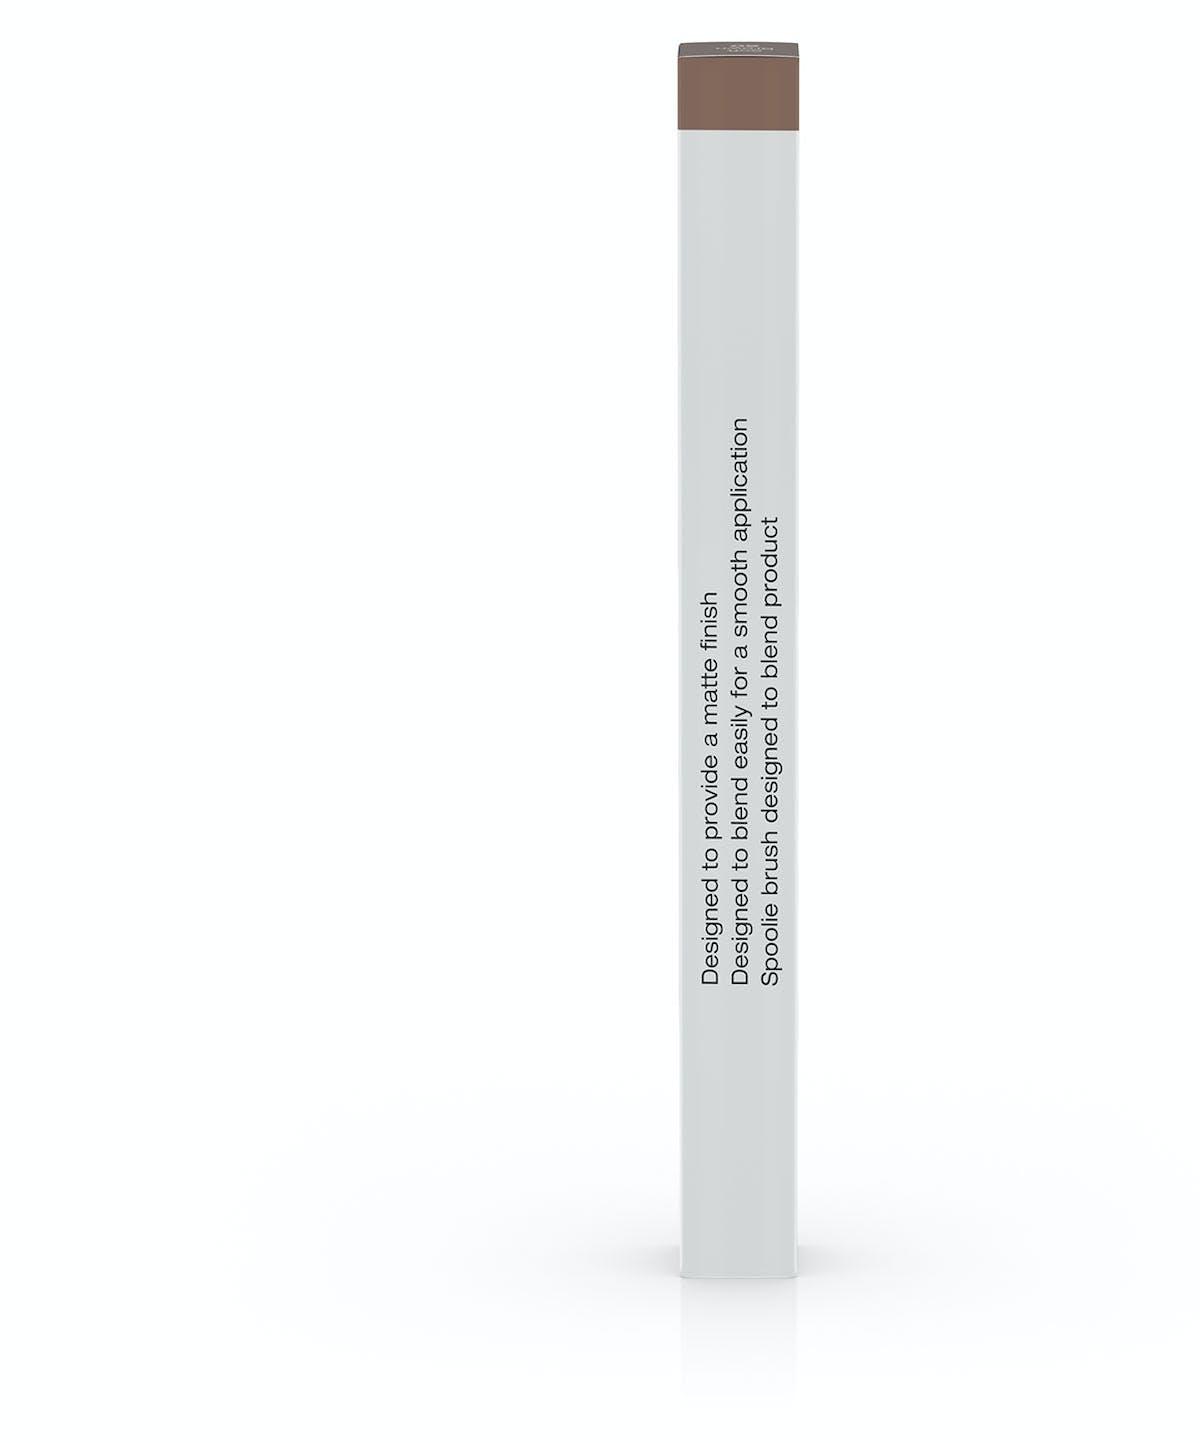 Nourishing Eyebrow Pencil With Spoolie Brush Neutrogena